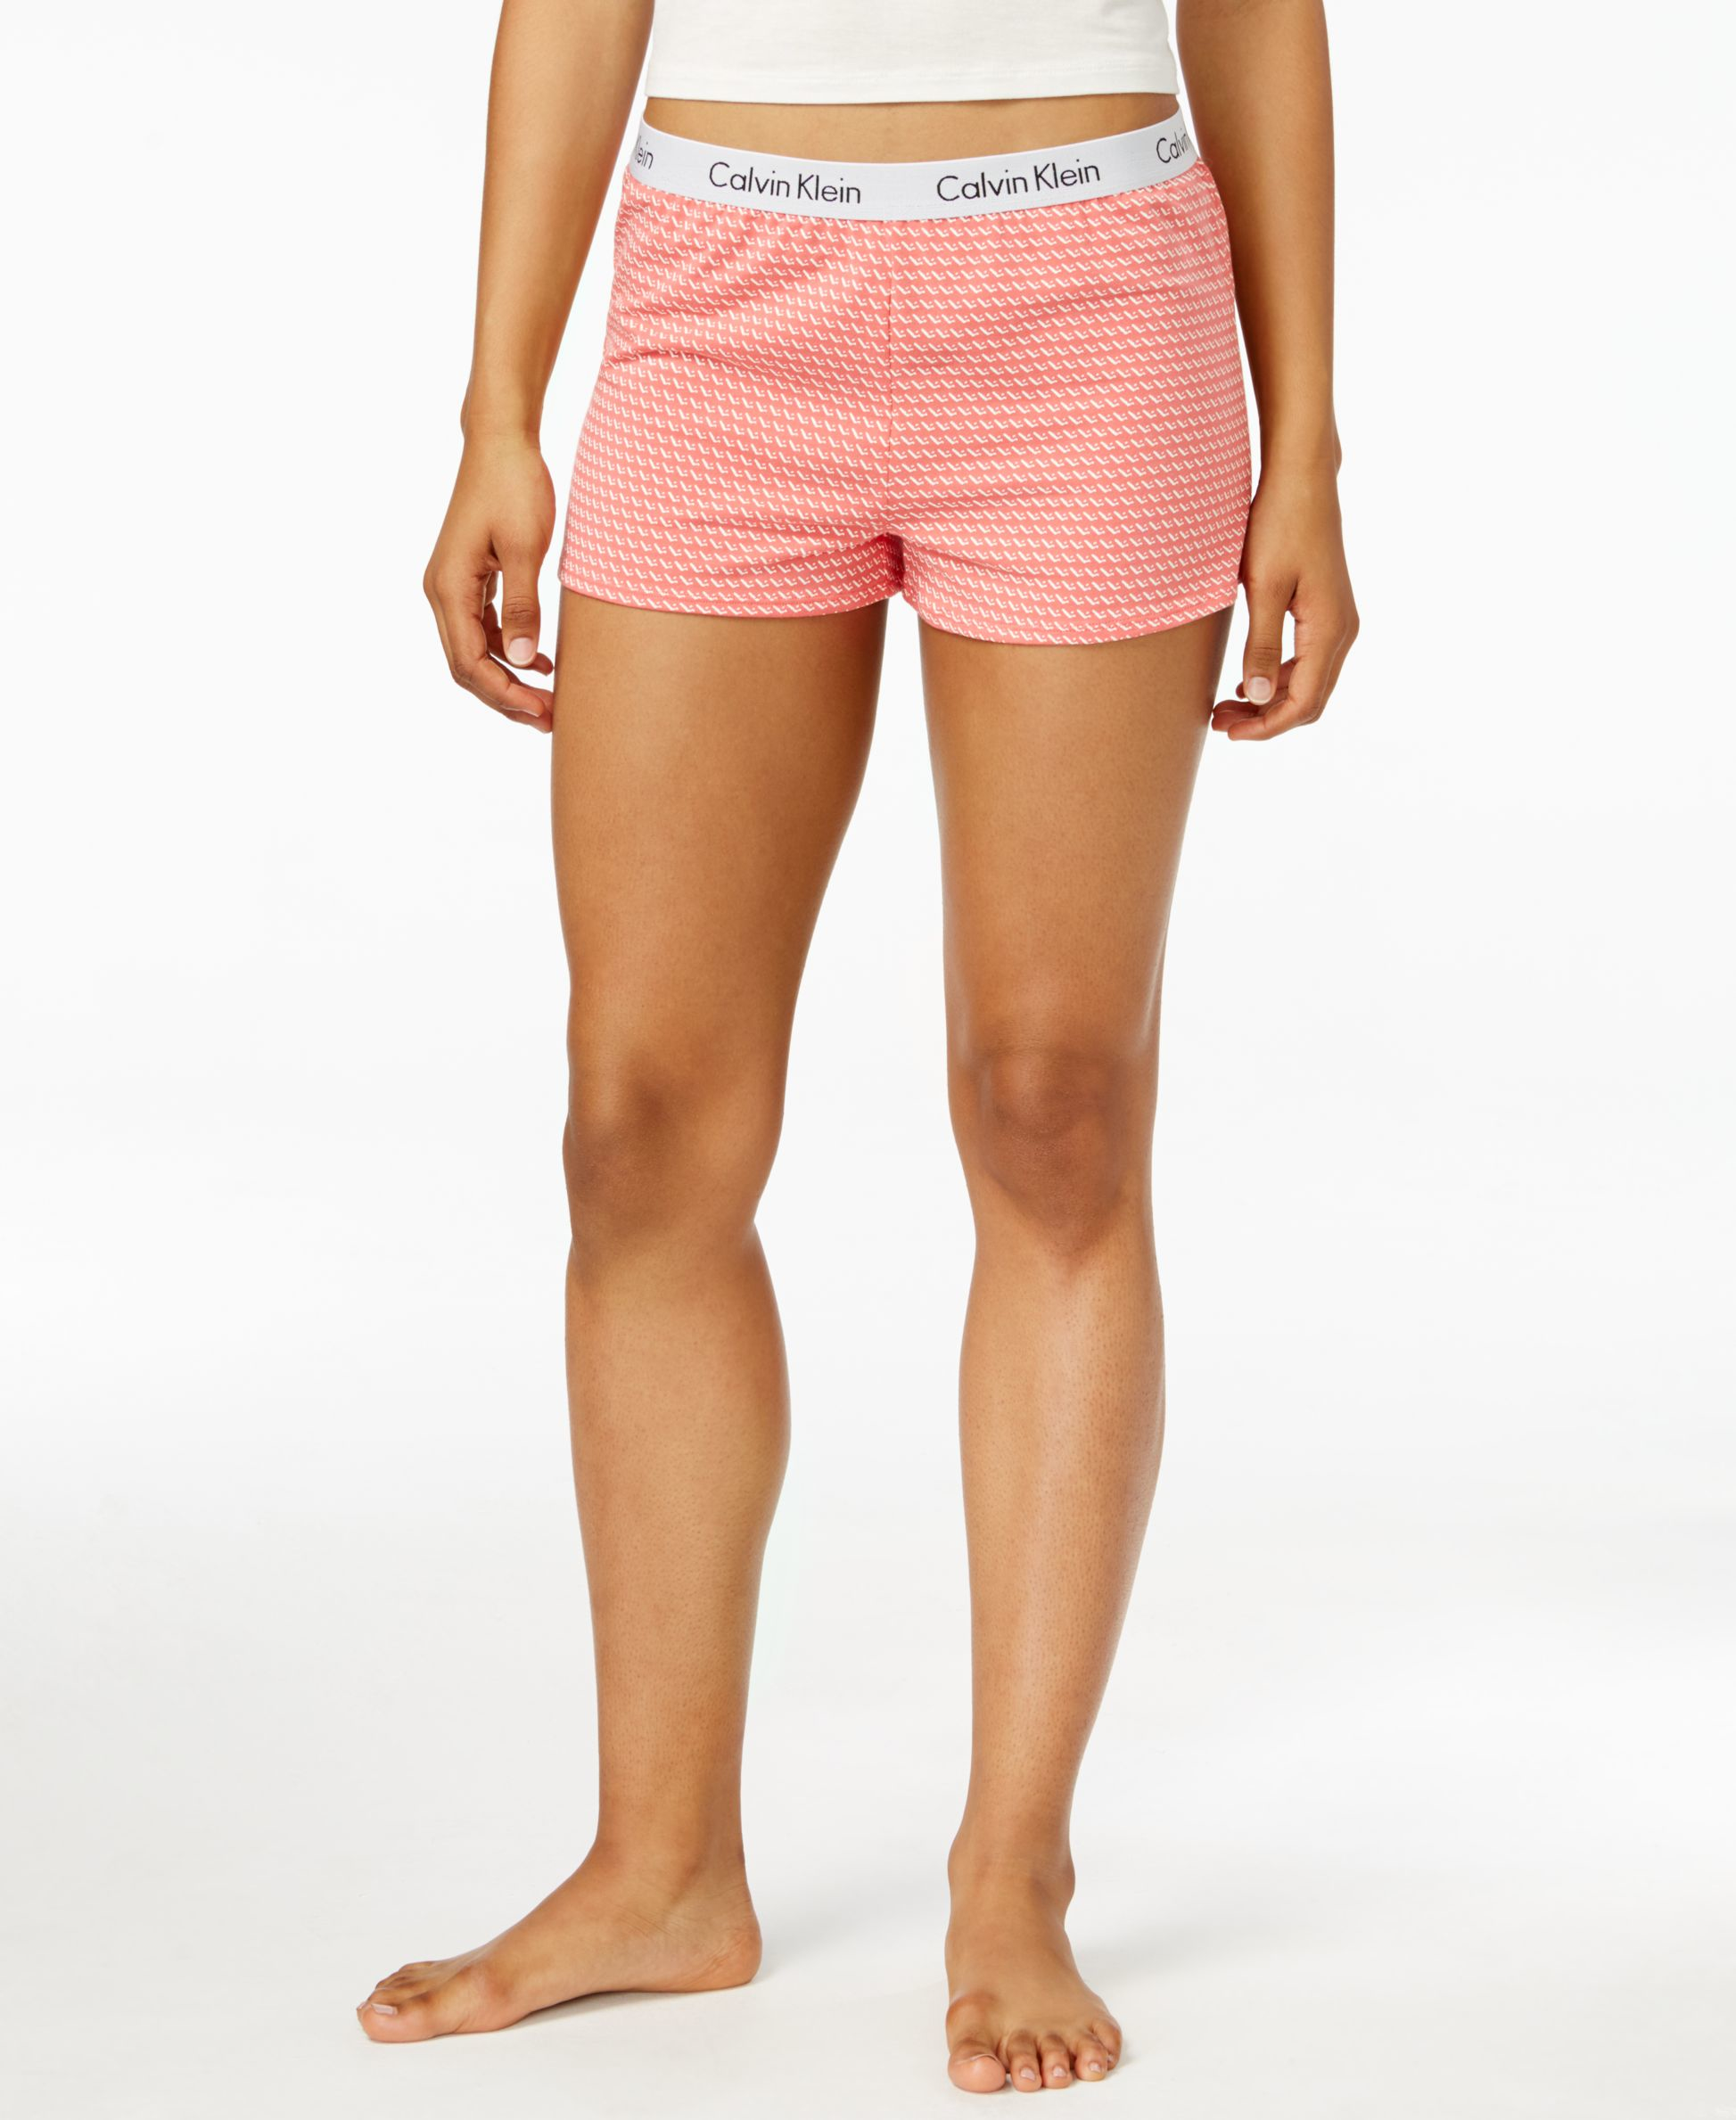 calvin klein logo boxer shorts in pink lyst. Black Bedroom Furniture Sets. Home Design Ideas